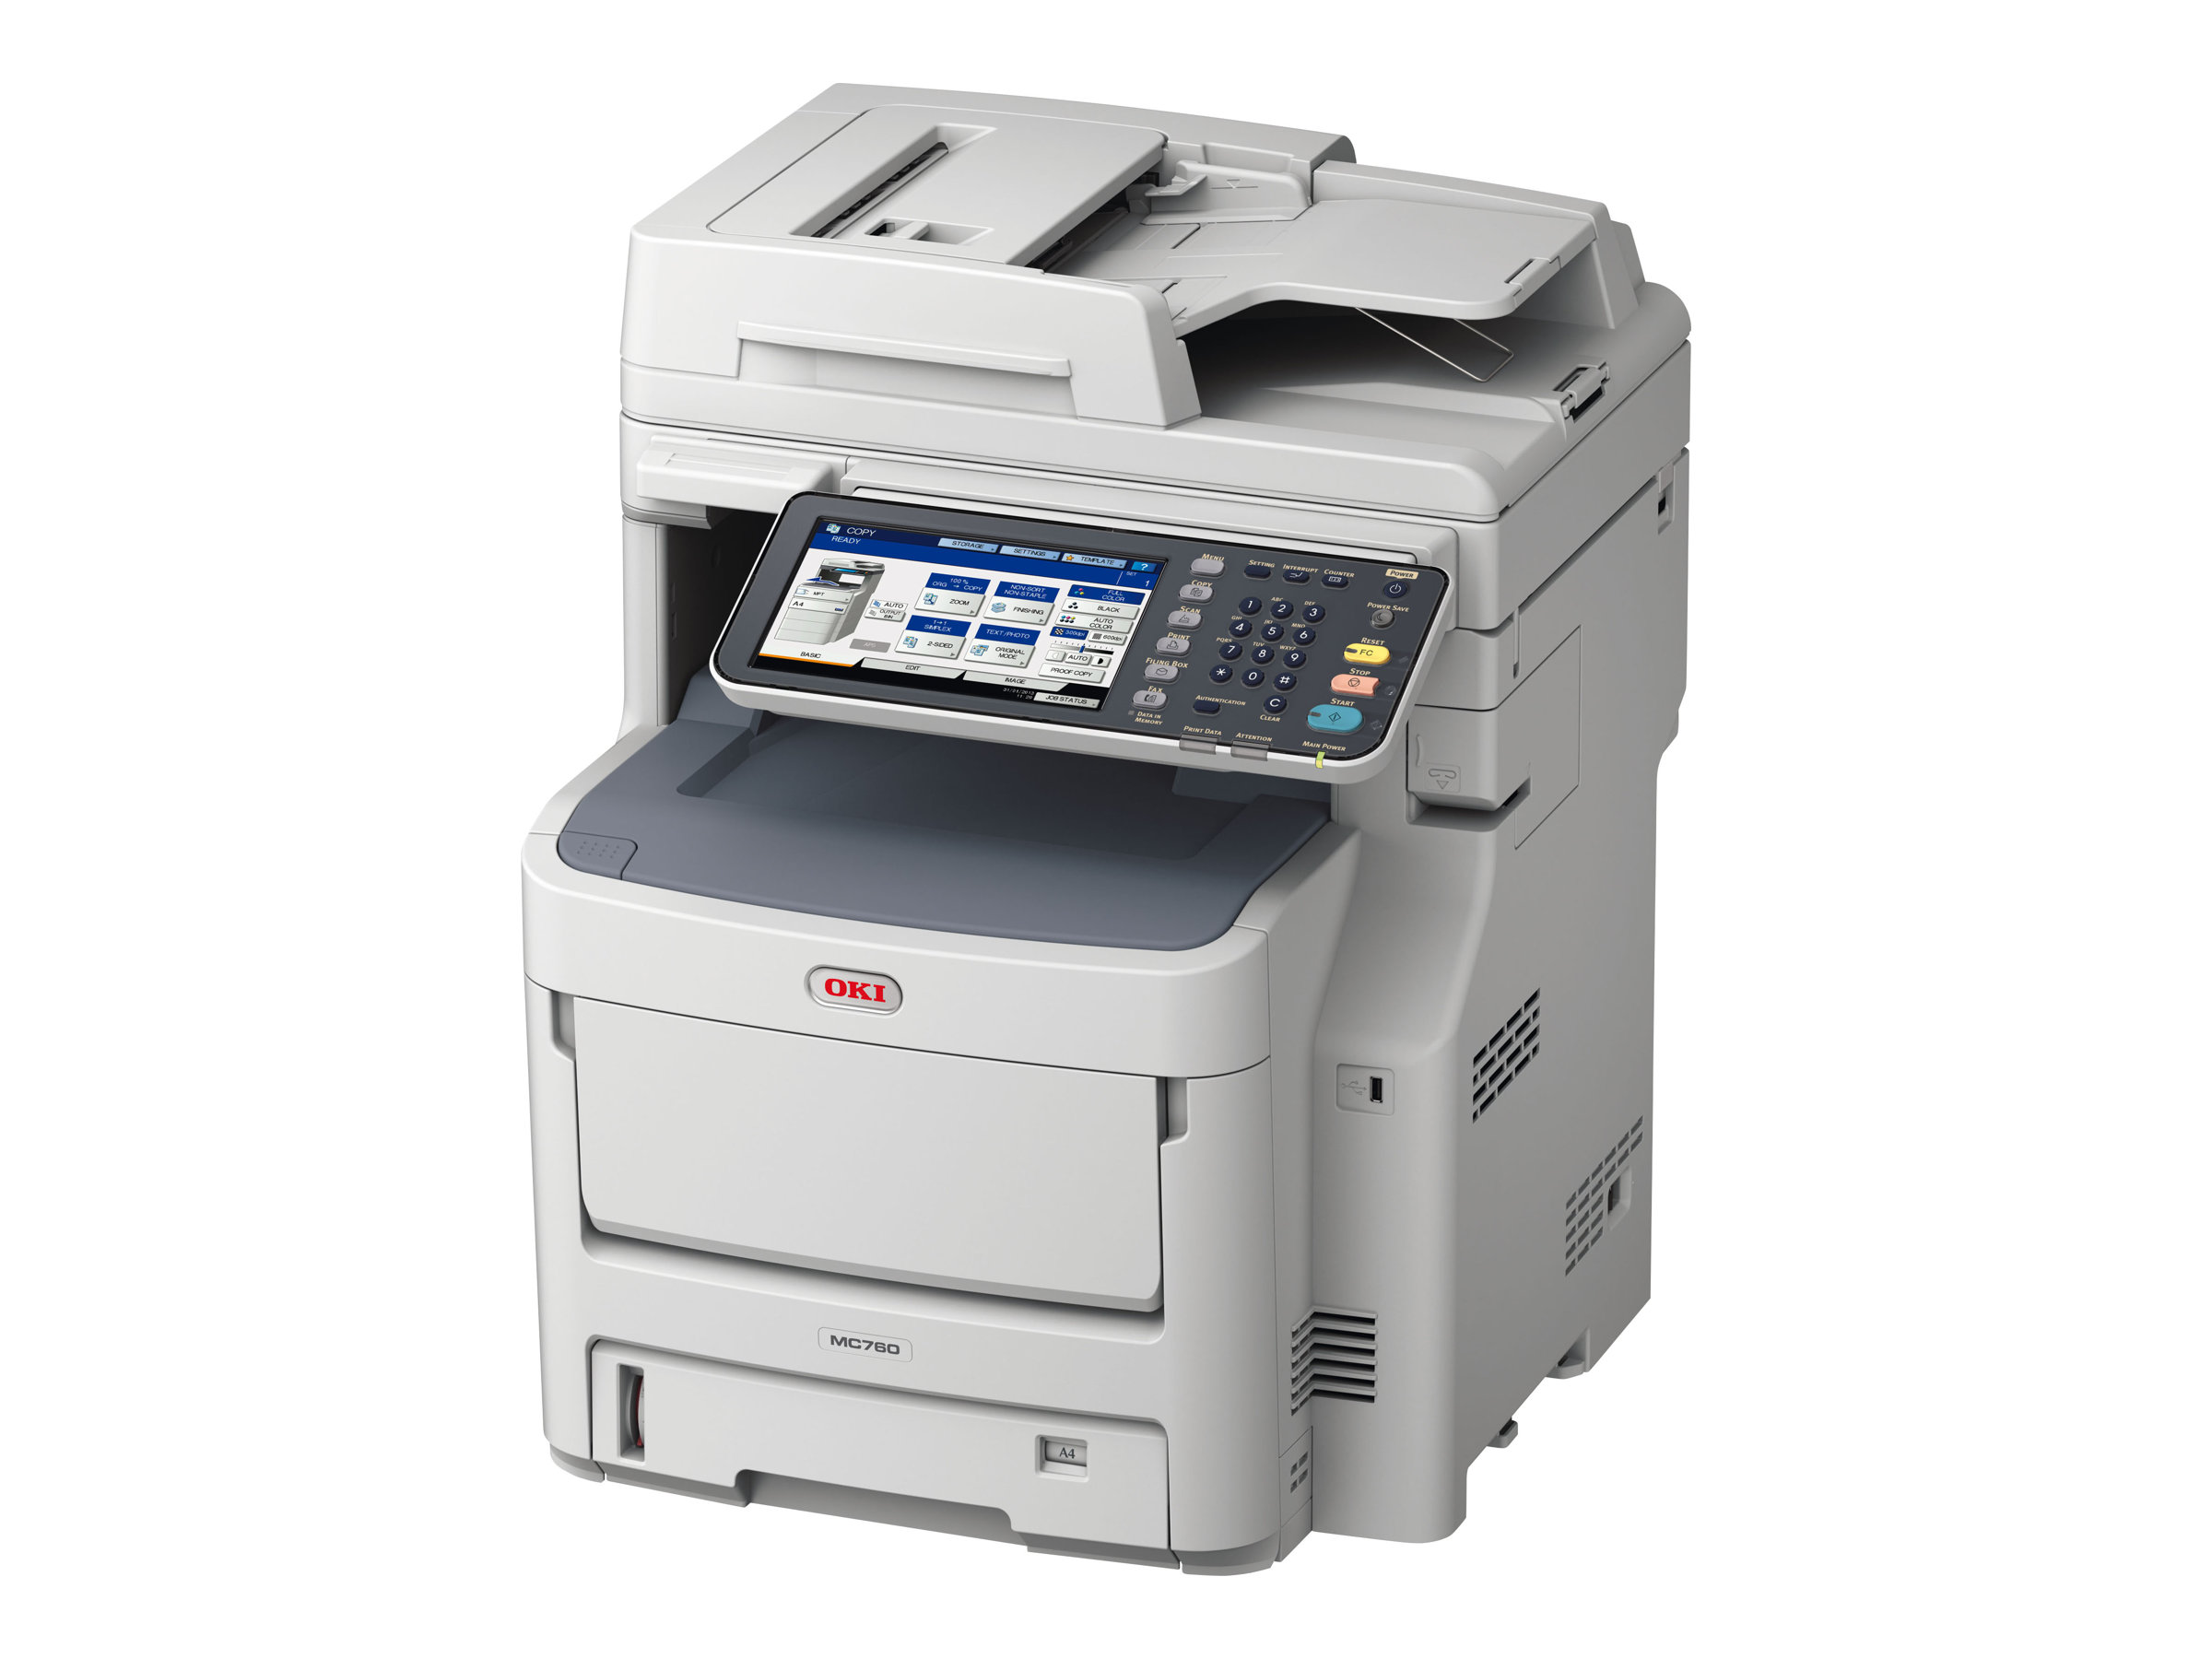 OKI MC760dnfax - Multifunktionsdrucker - Farbe - LED - A4 (210 x 297 mm) (Original) - A4 (Medien)